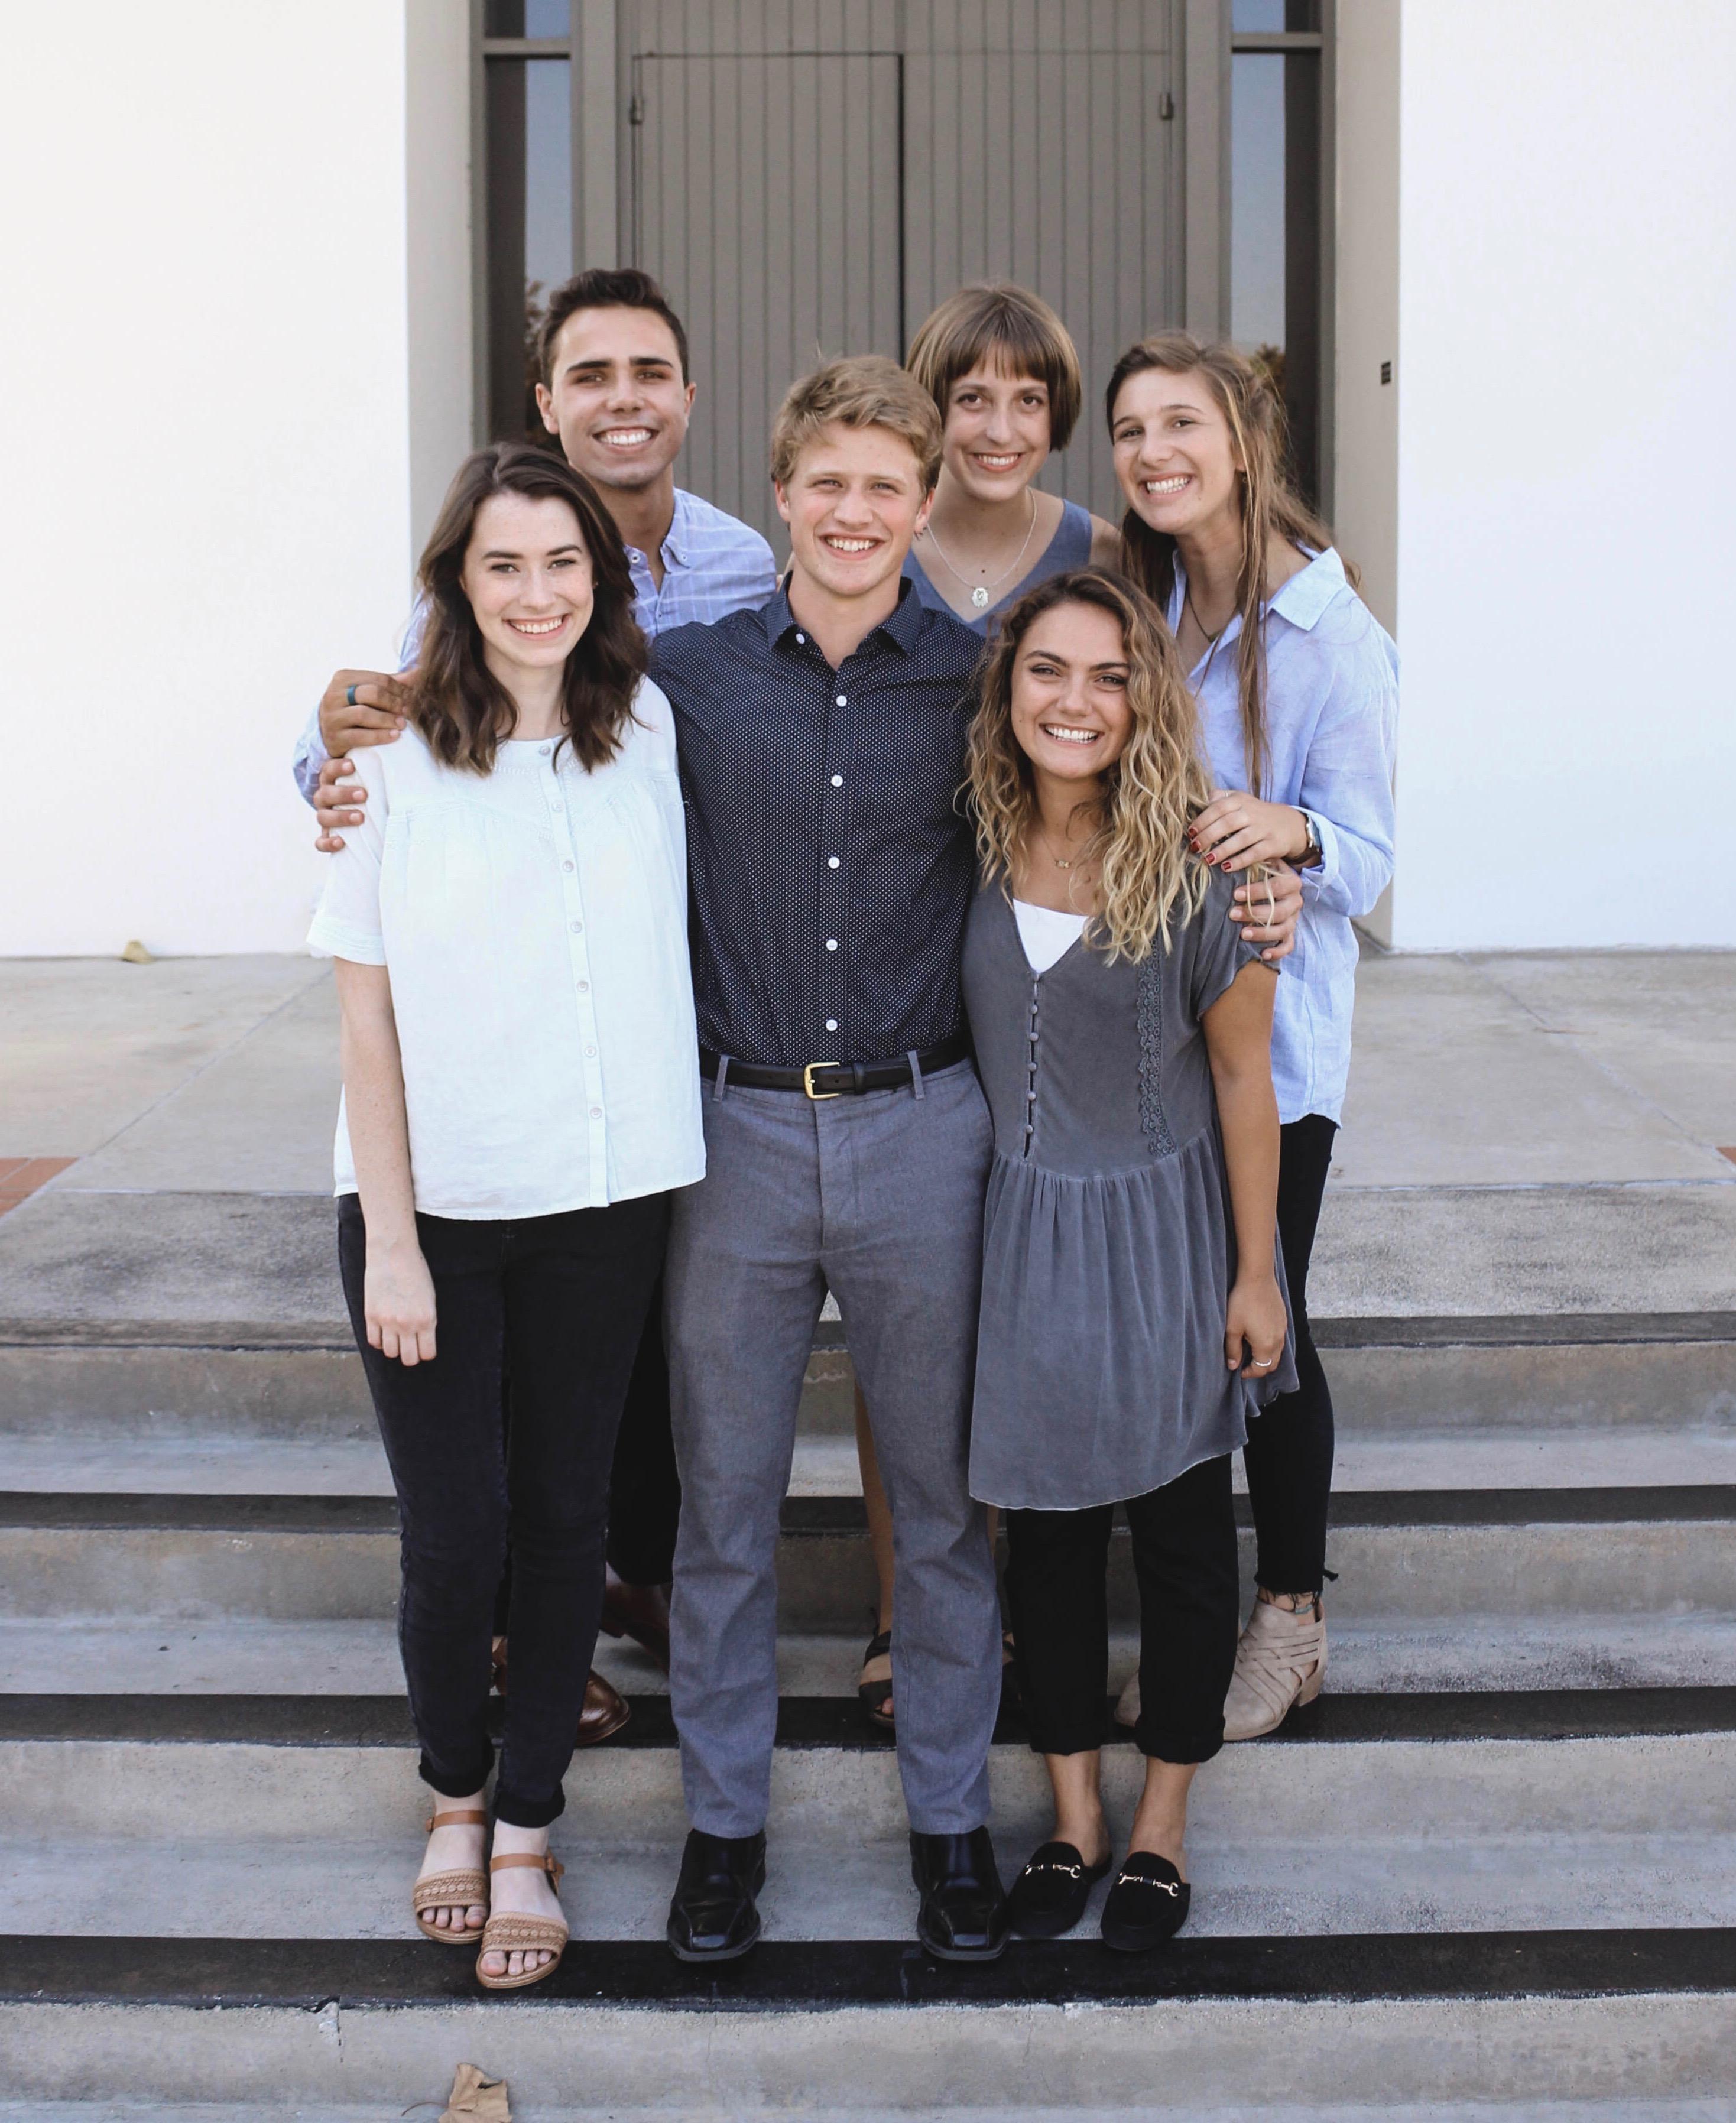 SMU Global Missions